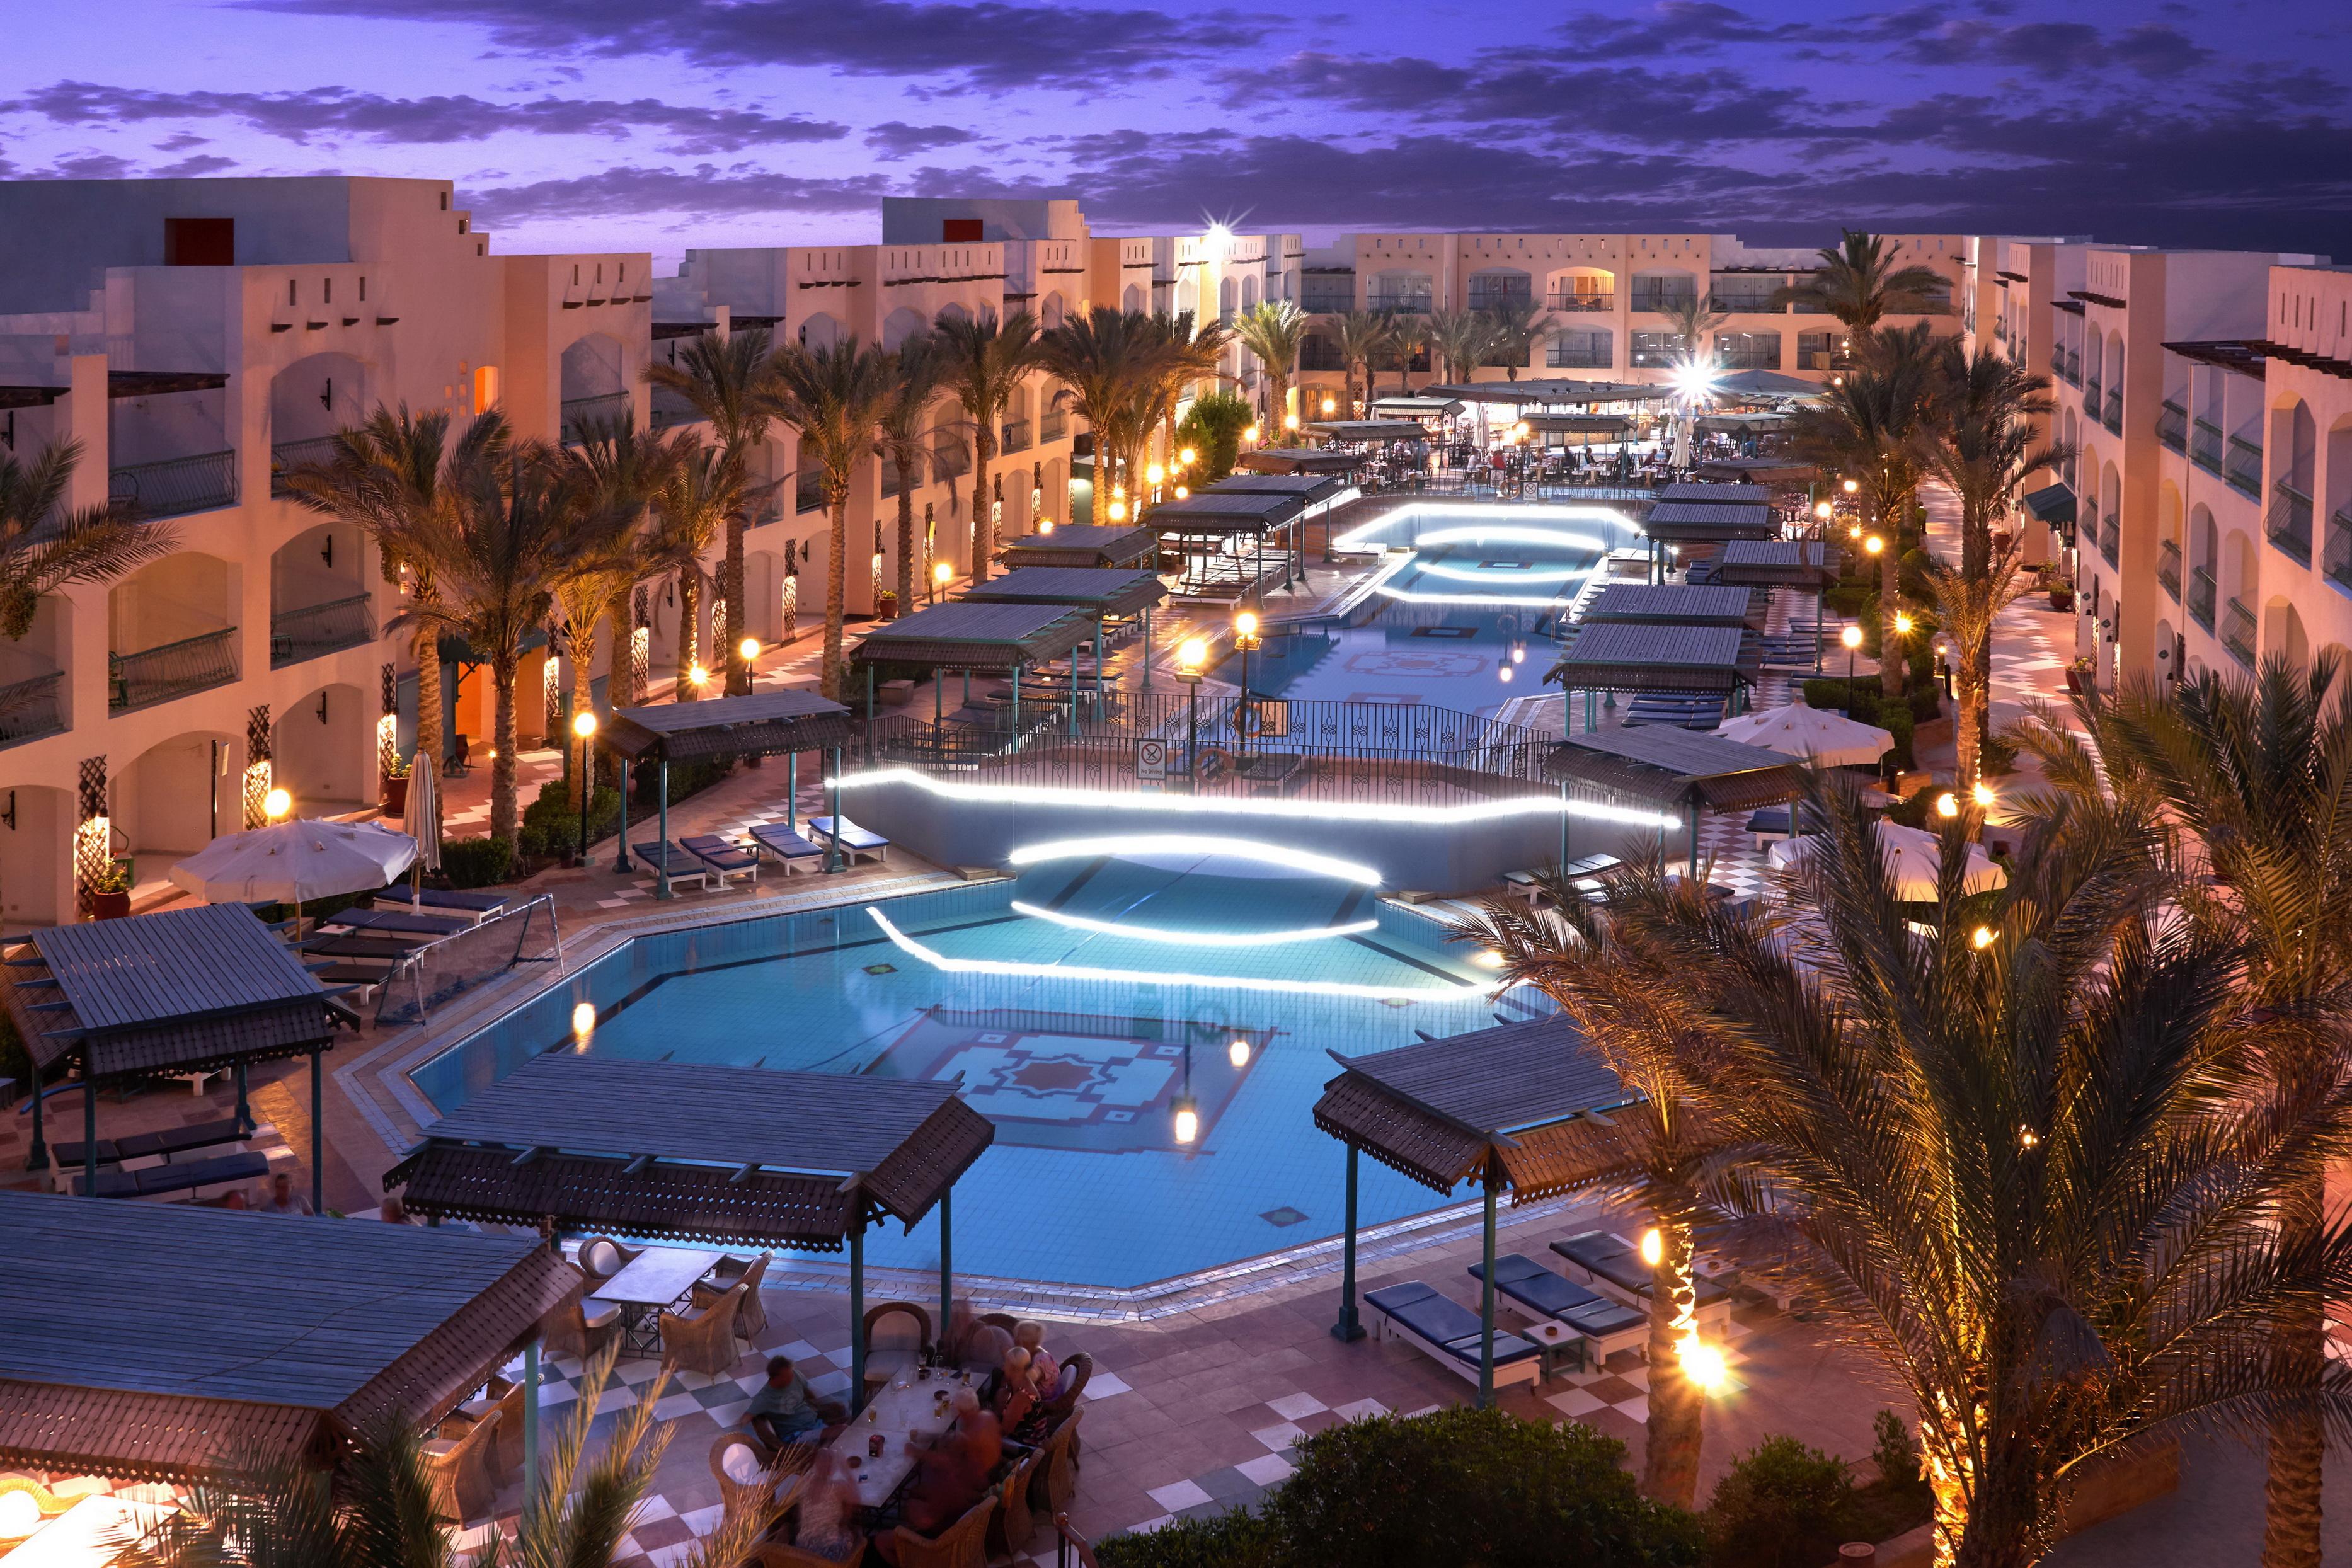 Reisevideos Hotel Bel Air Azur Resort